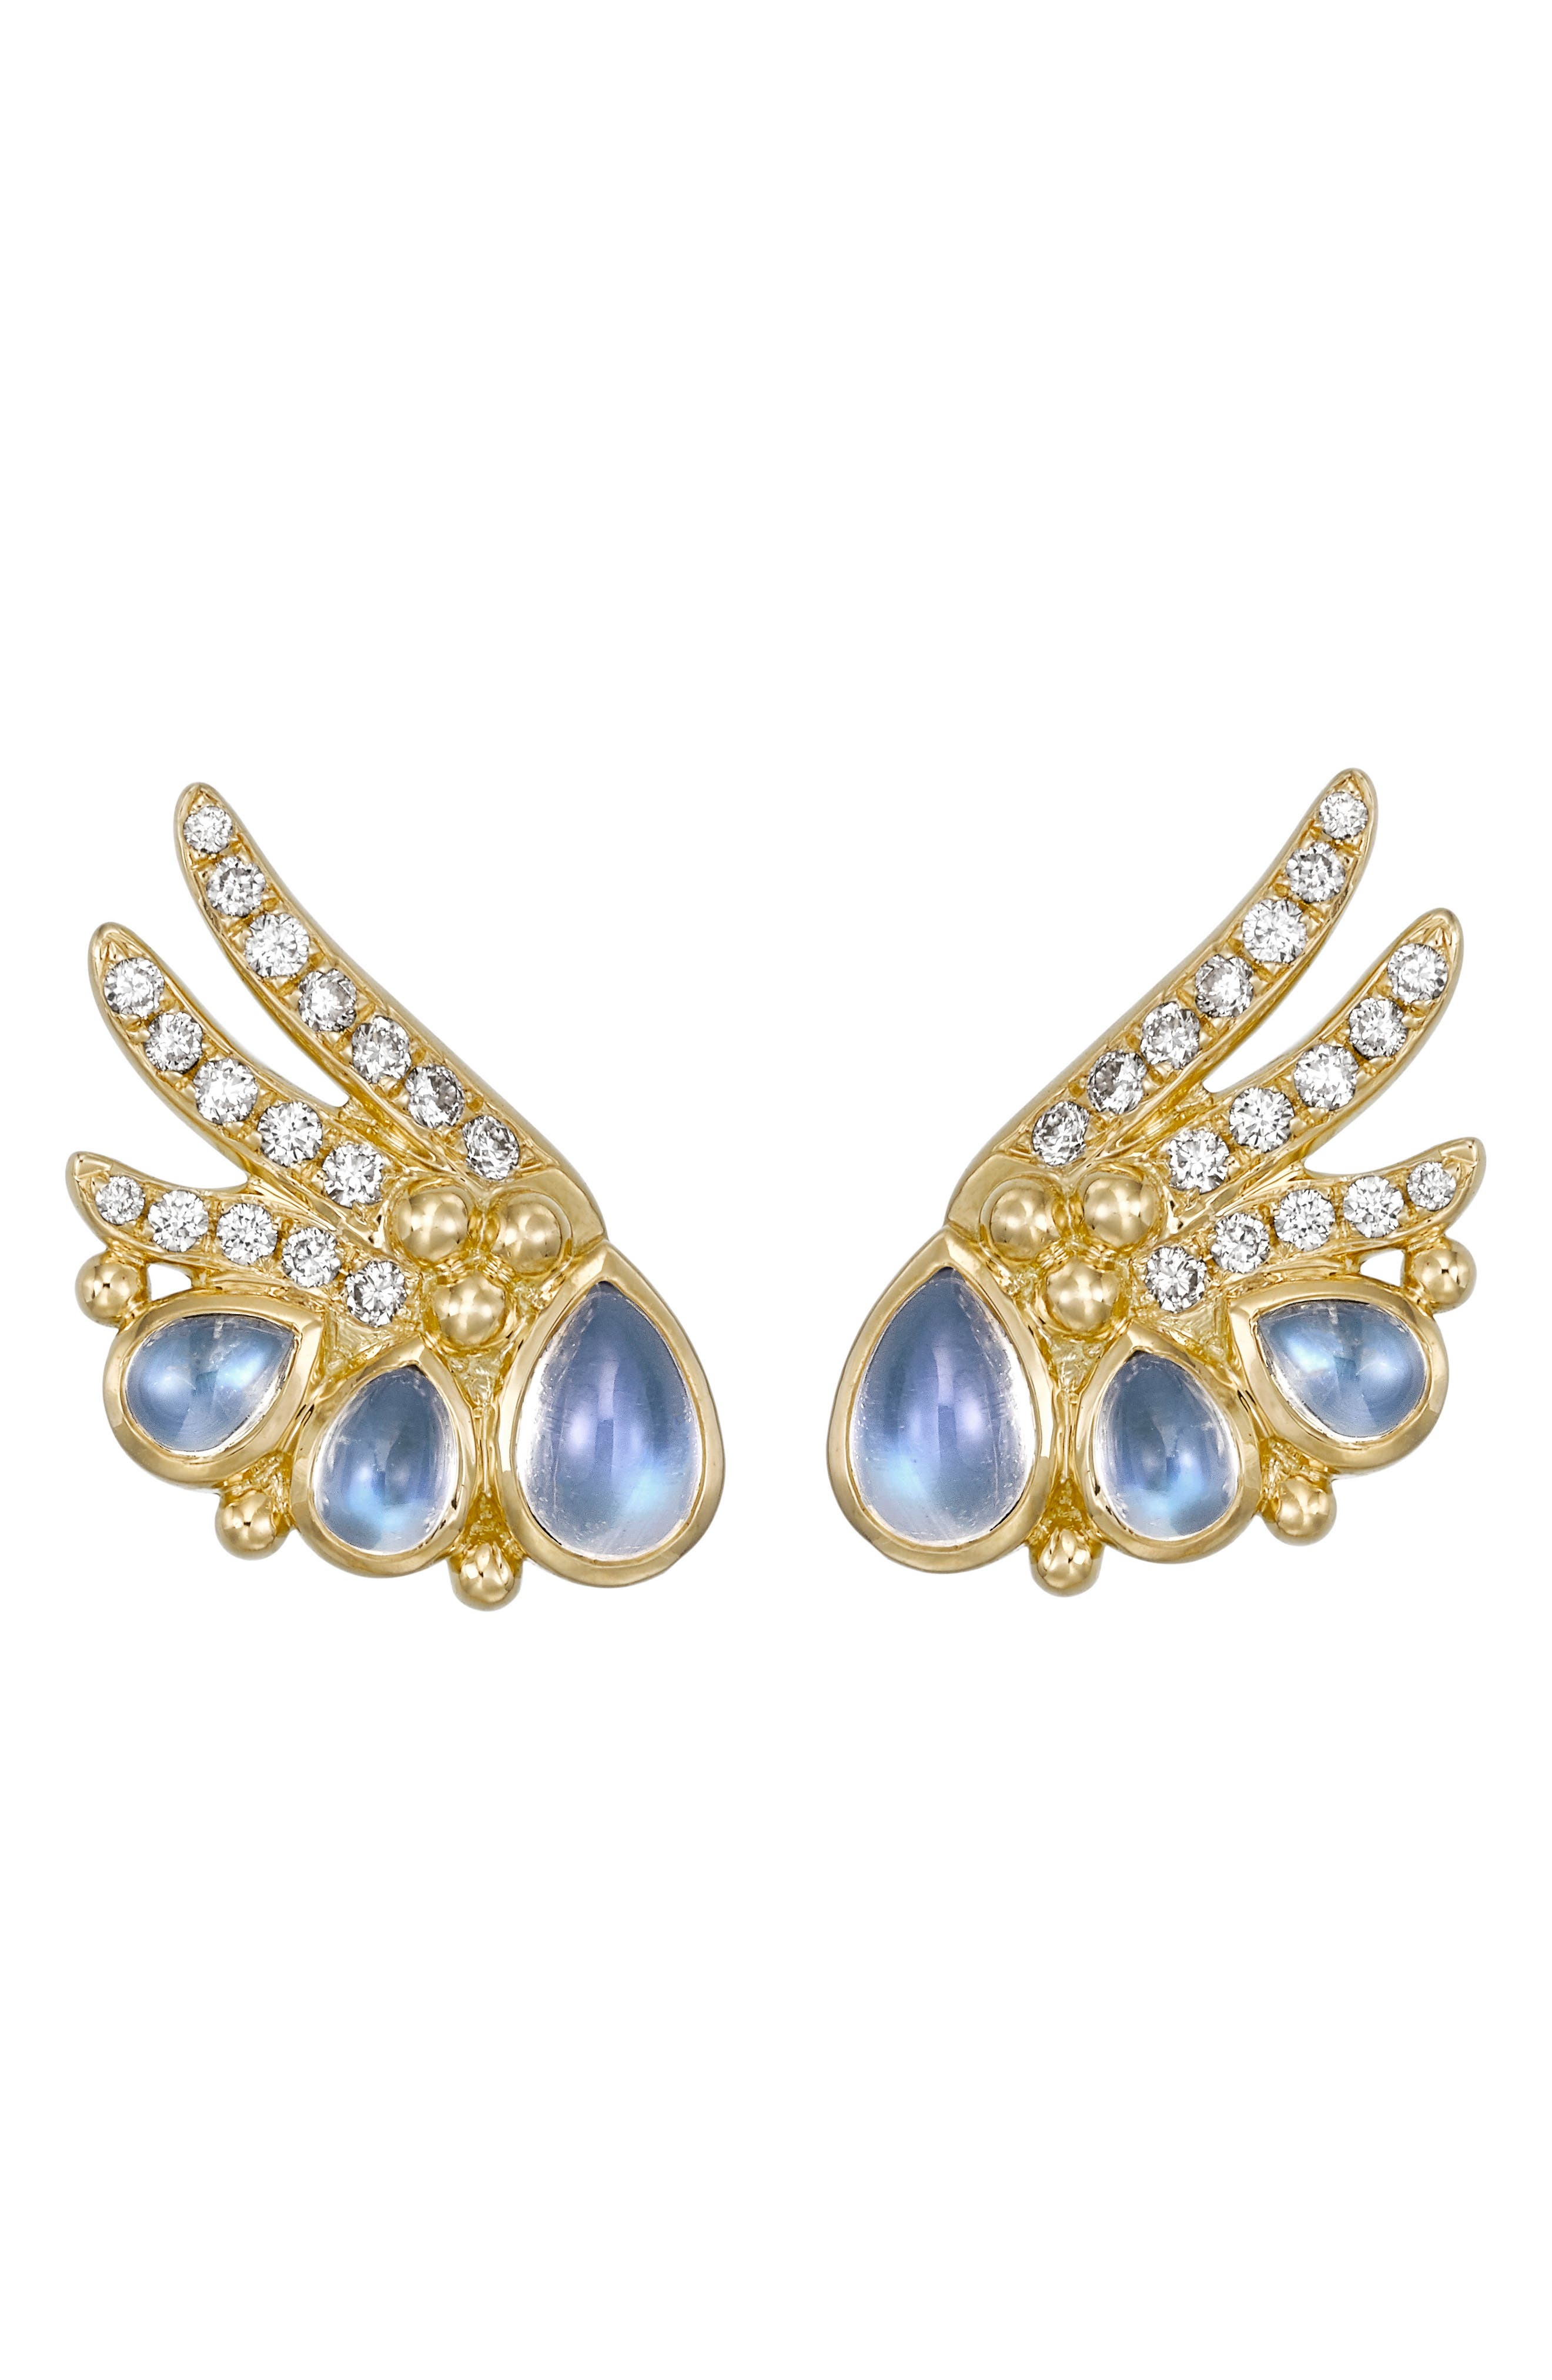 Temple St. Clair Object Trouvé Diamond Moonstone Earrings